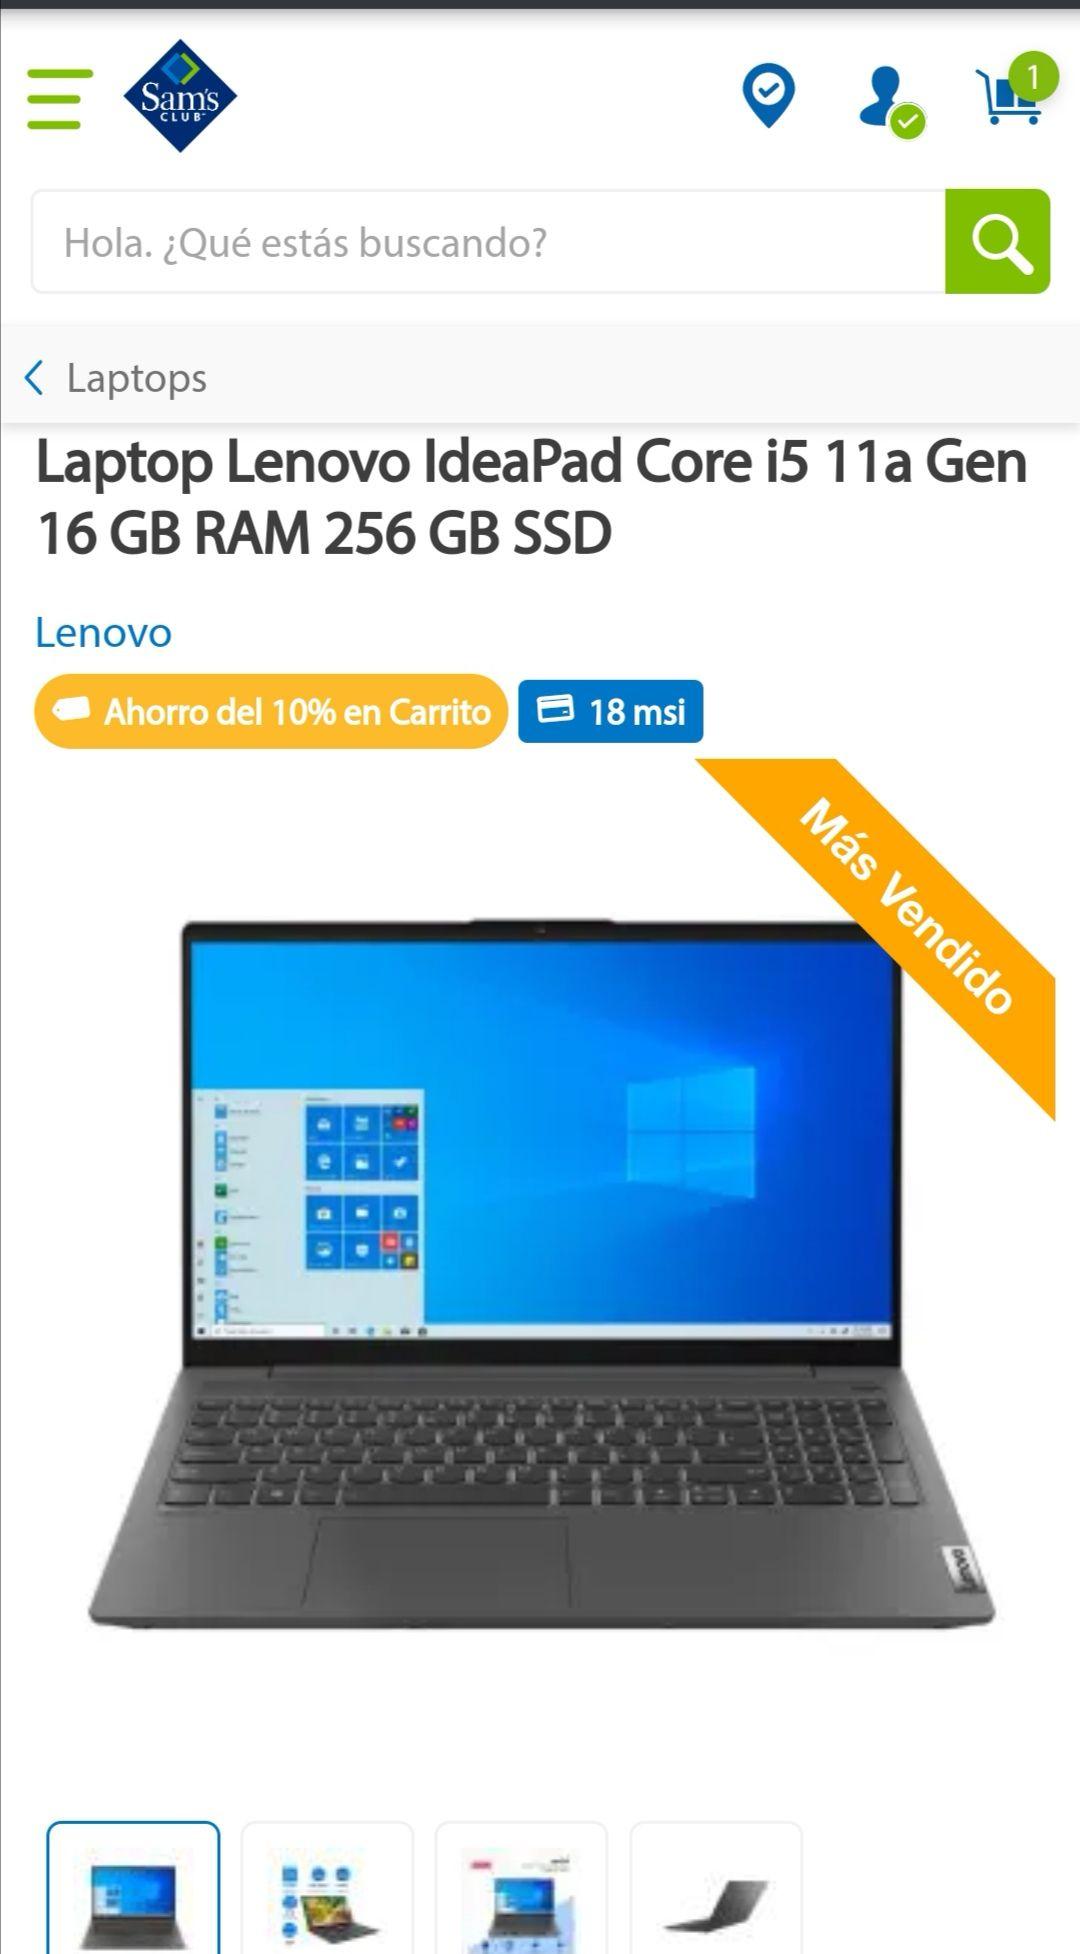 Sam's Club: Lenovo IdeaPad Core i5 11a Gen 16 GB RAM 256 GB SSD con dedicada NVIDA GE Force MX450